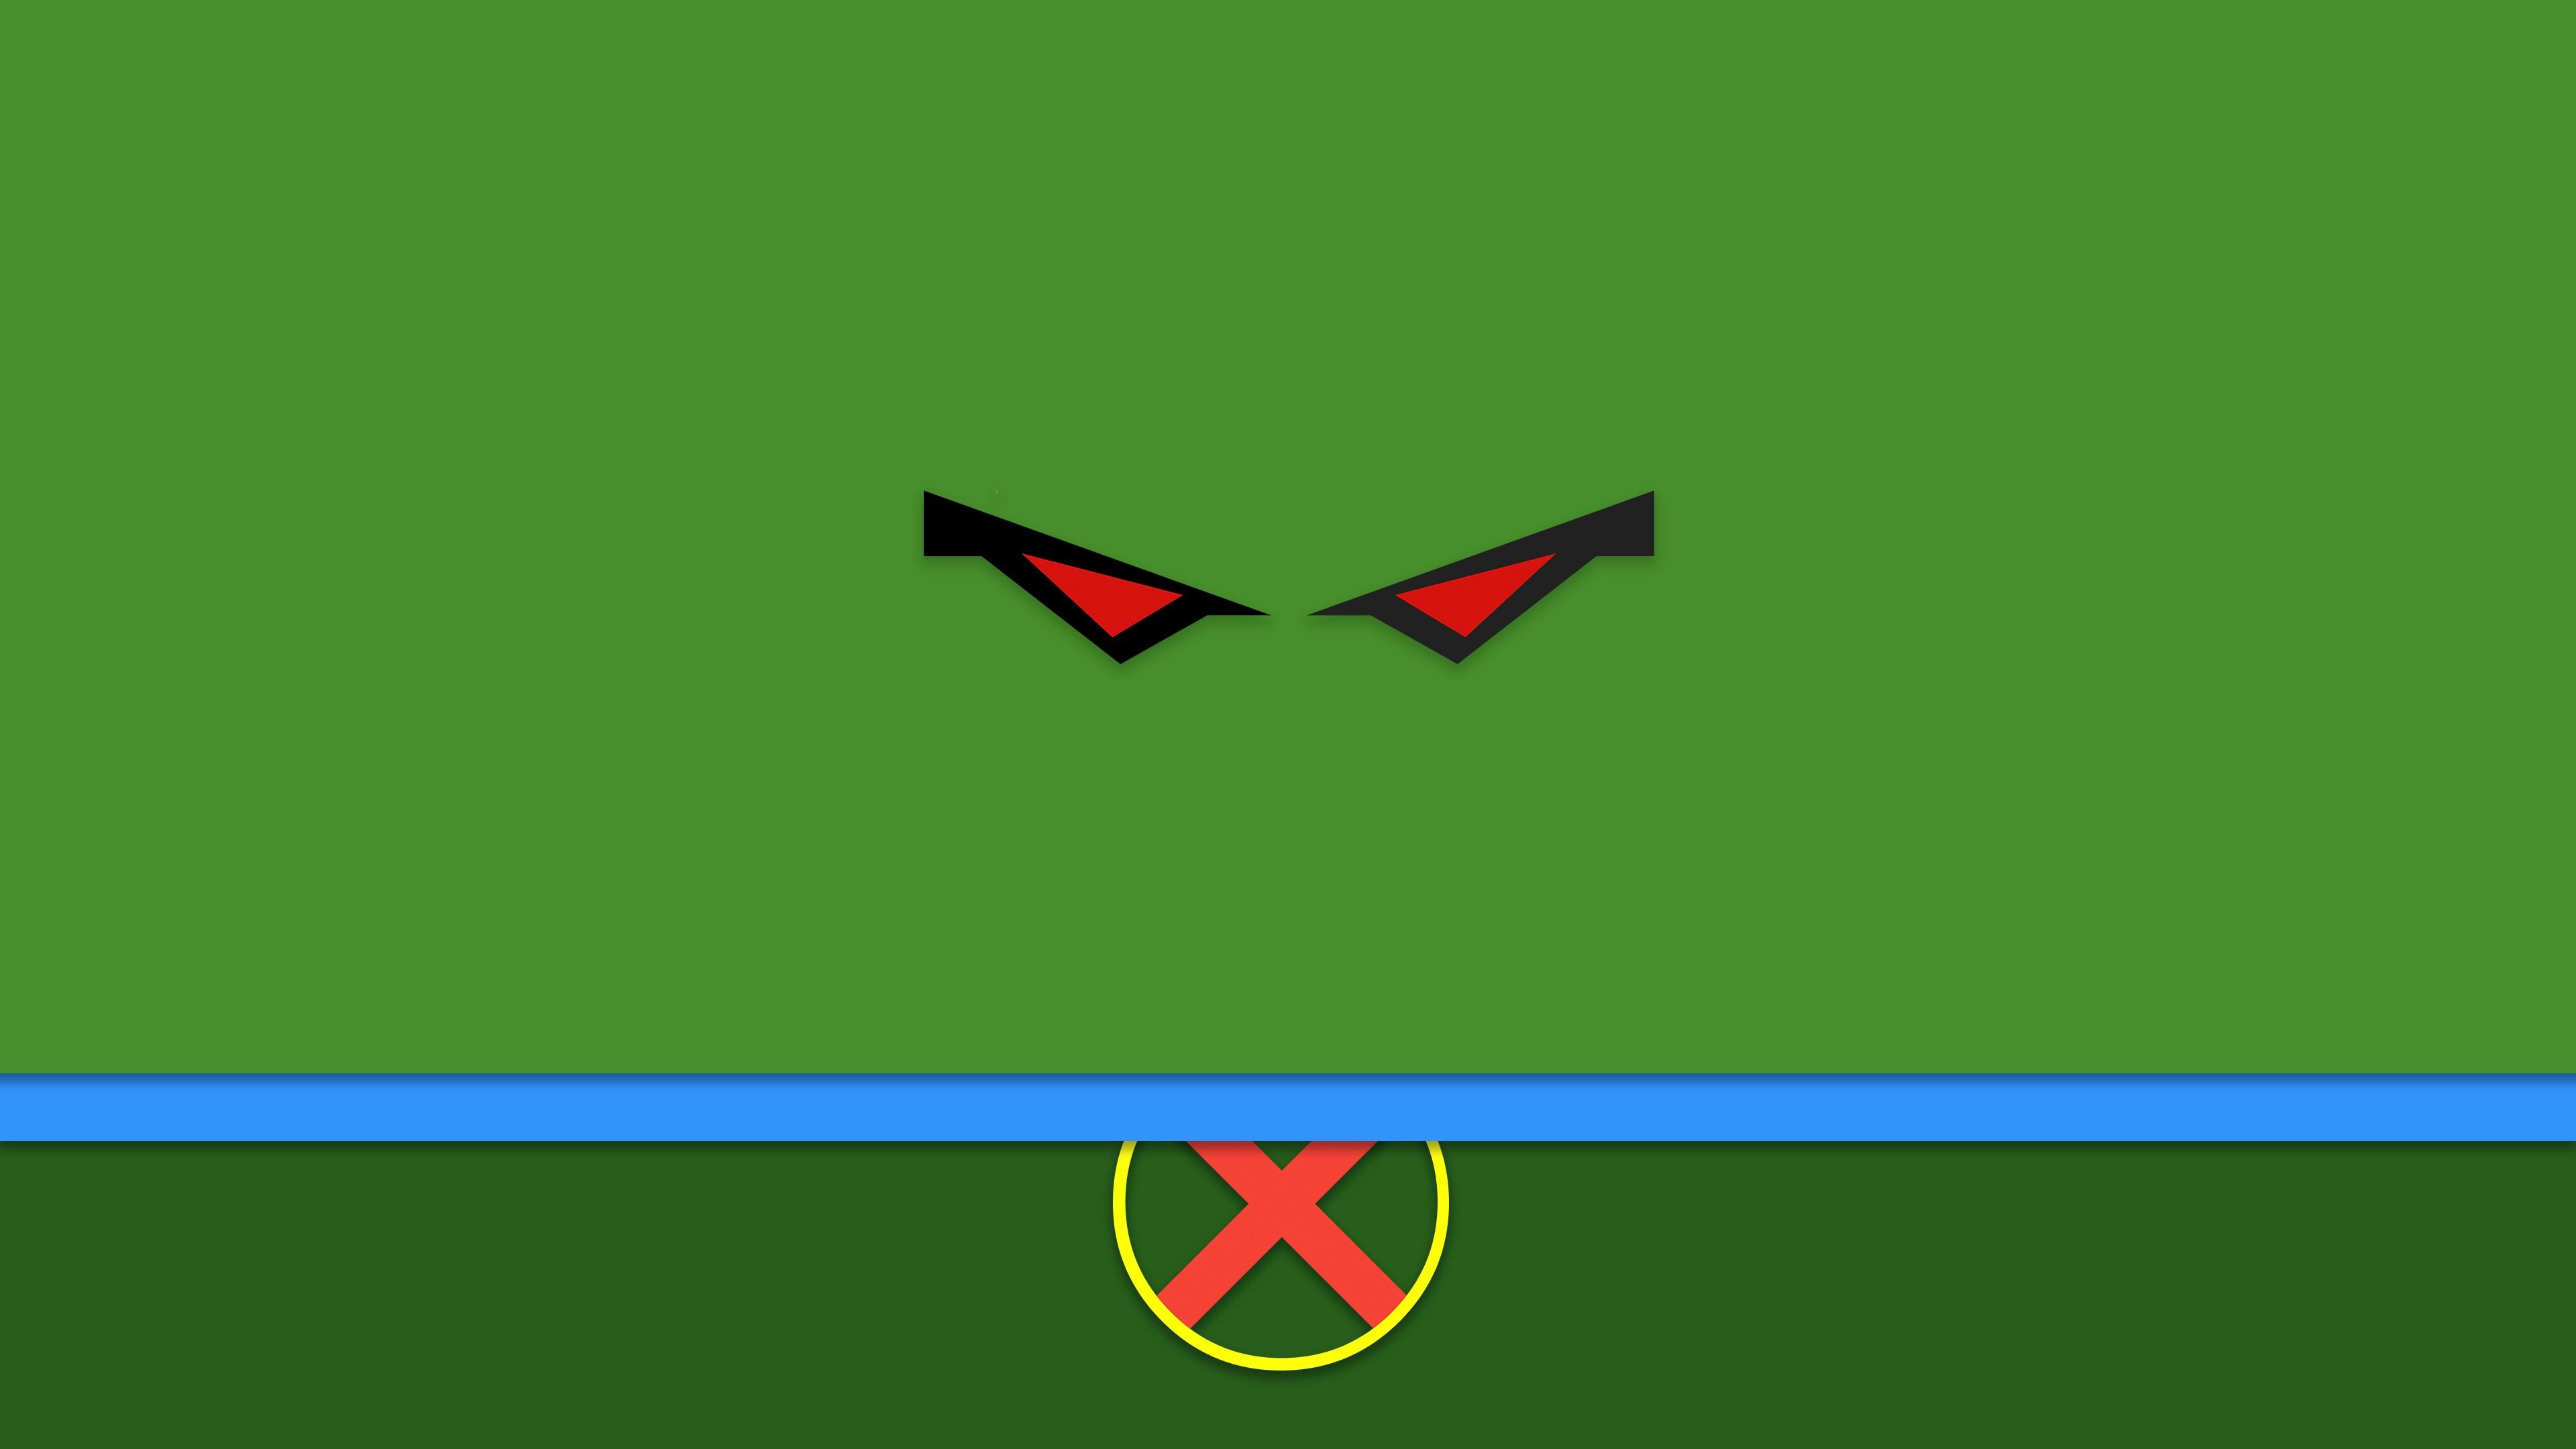 x-free-high-resolution-martian-manhunter-wallpaper-wpc5801408